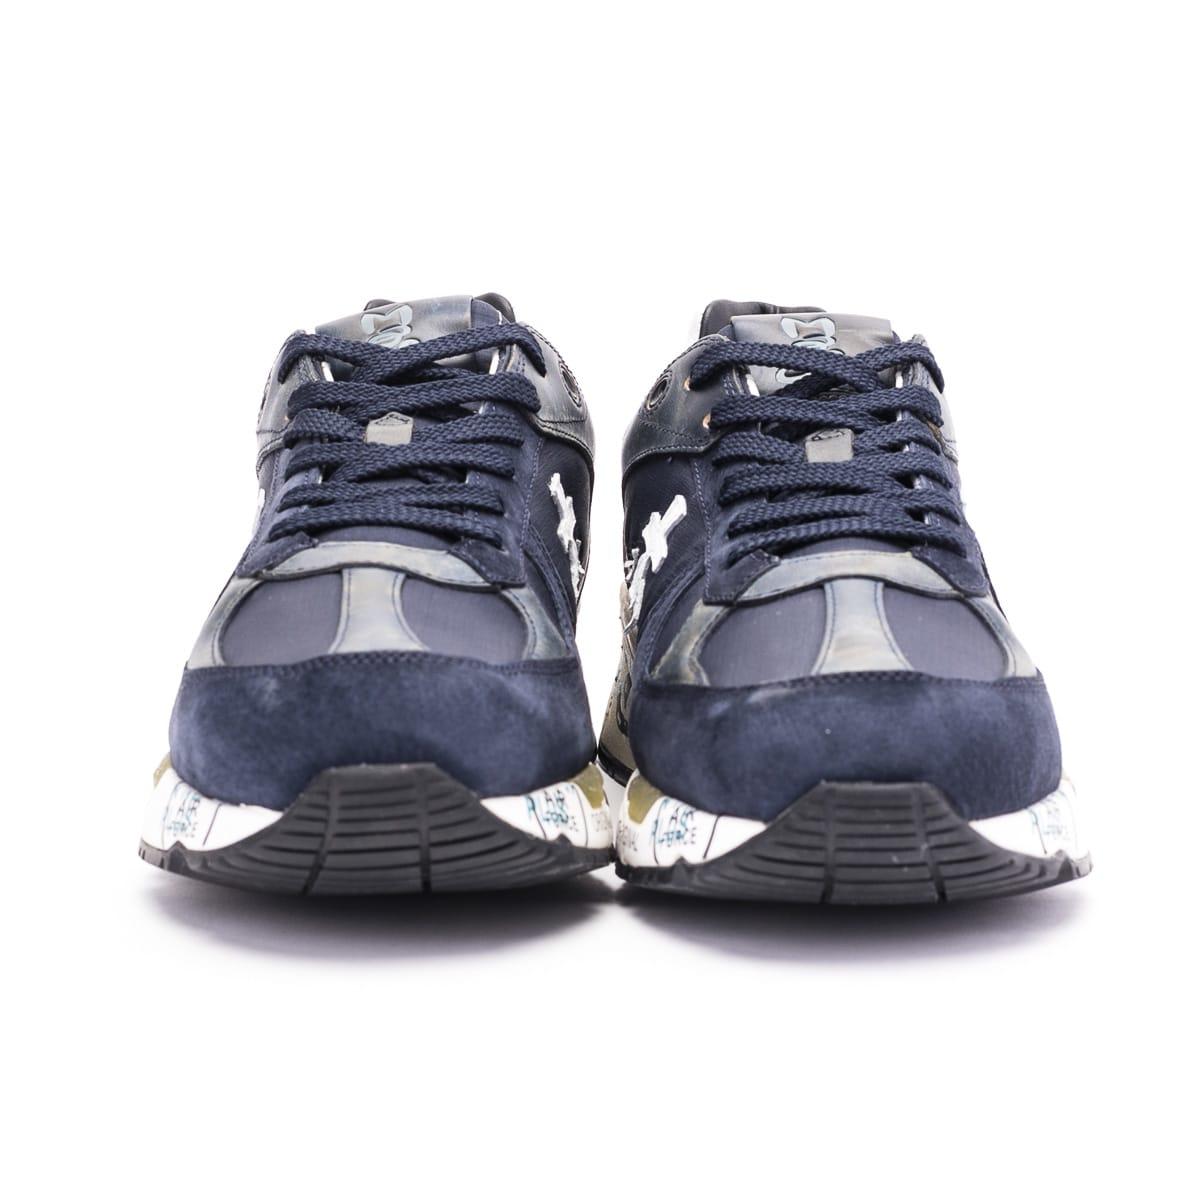 Premiata Mase Sneakers